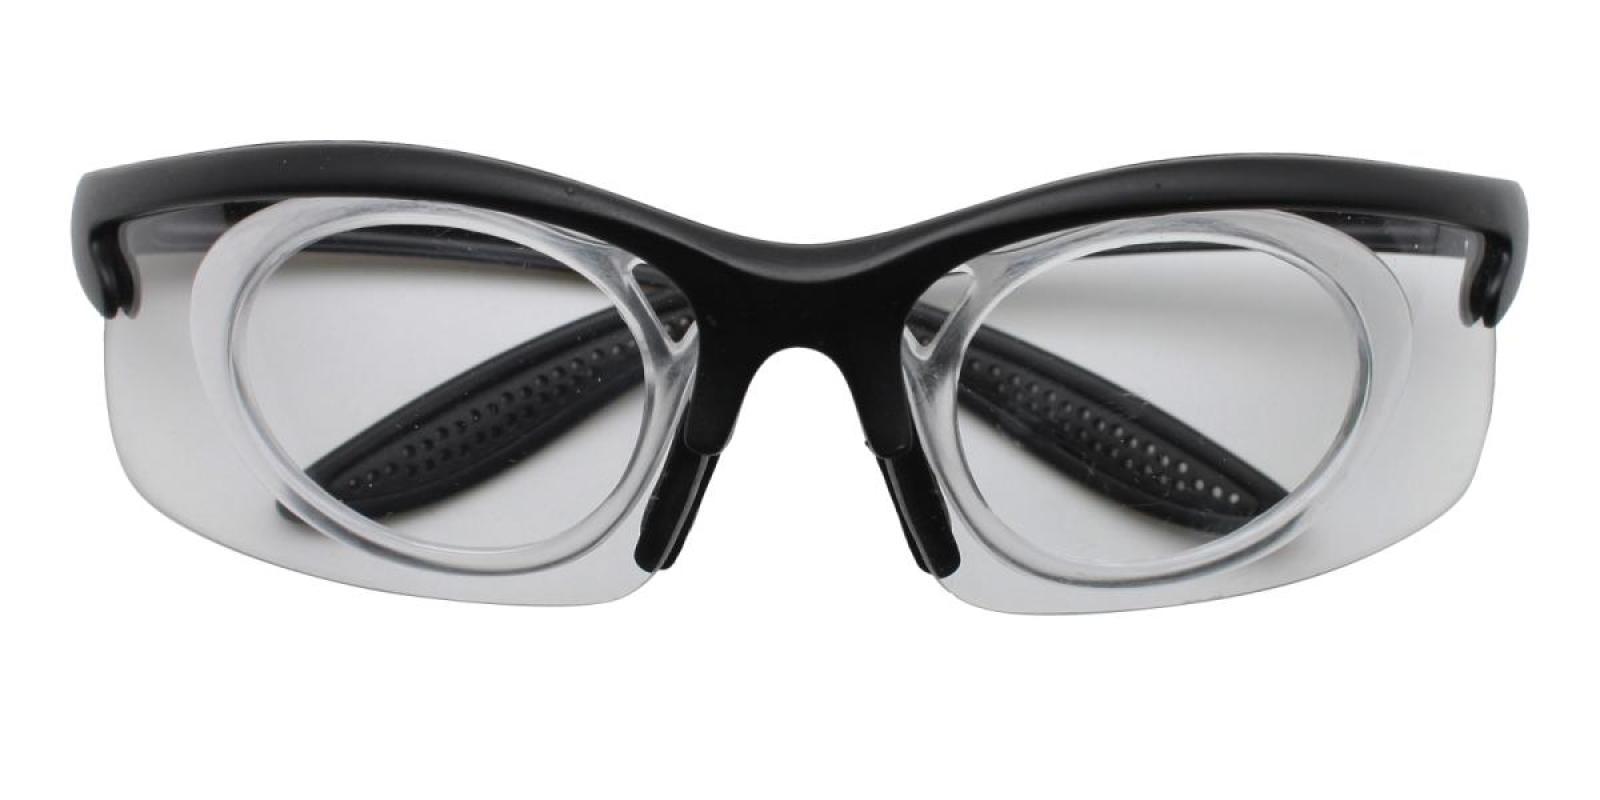 Borneo-Black-Geometric-Plastic-SportsGlasses-detail